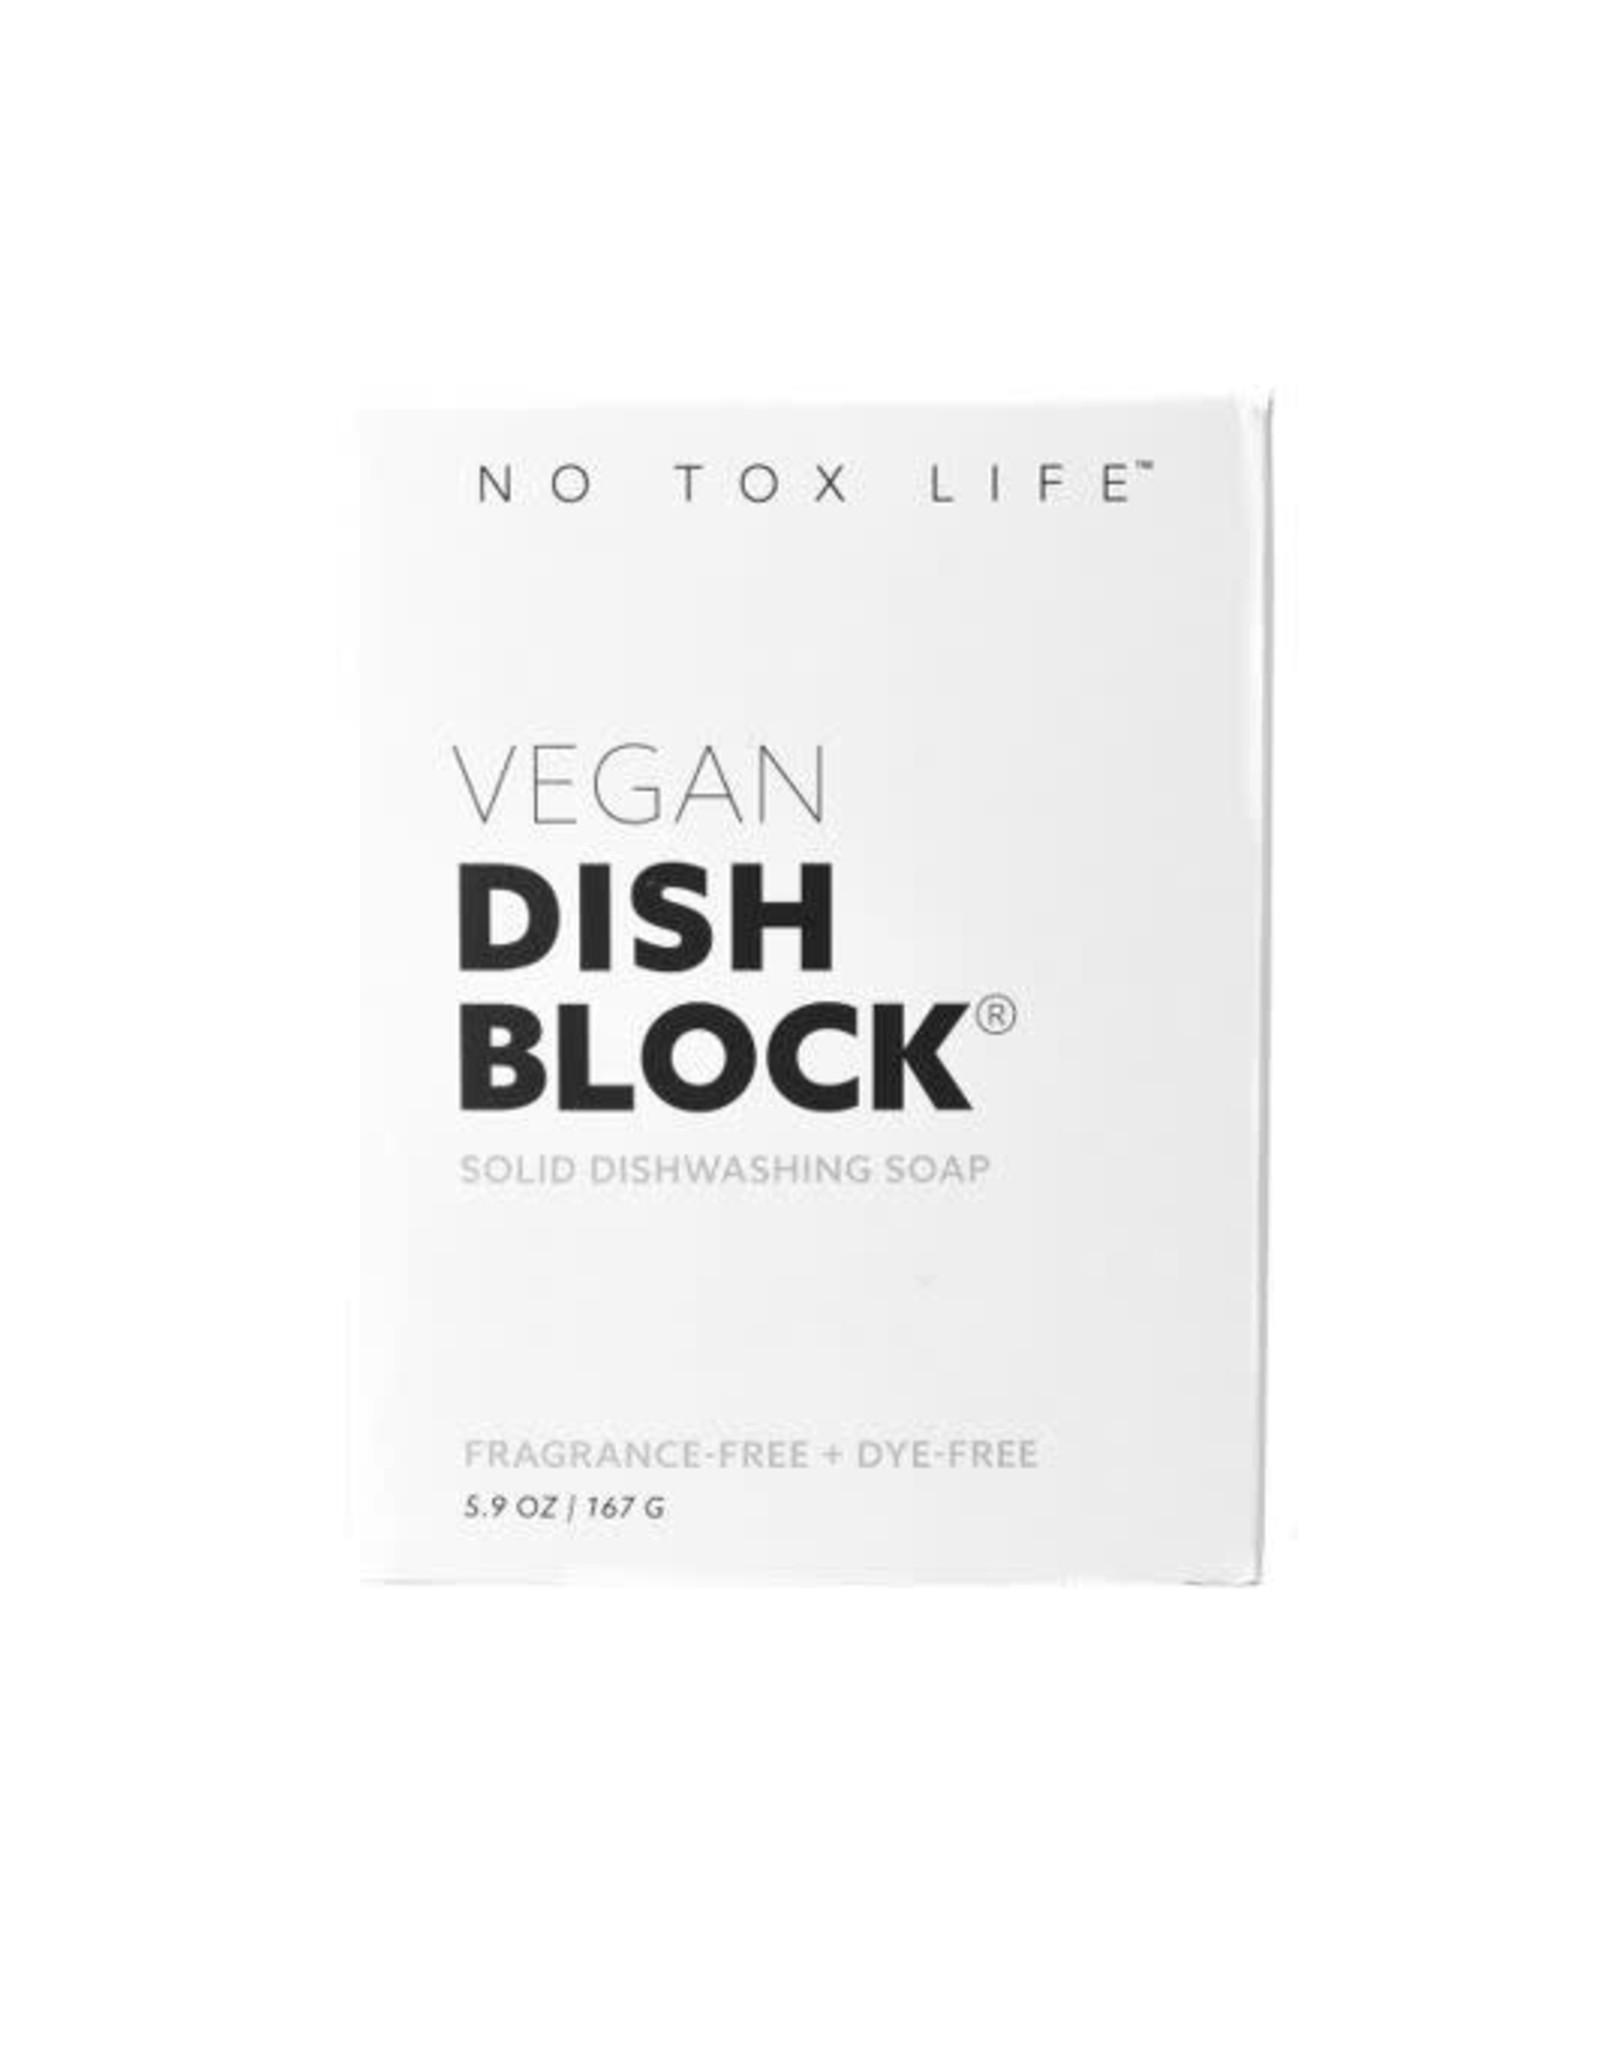 No Tox Life Dish Block -  5.9oz